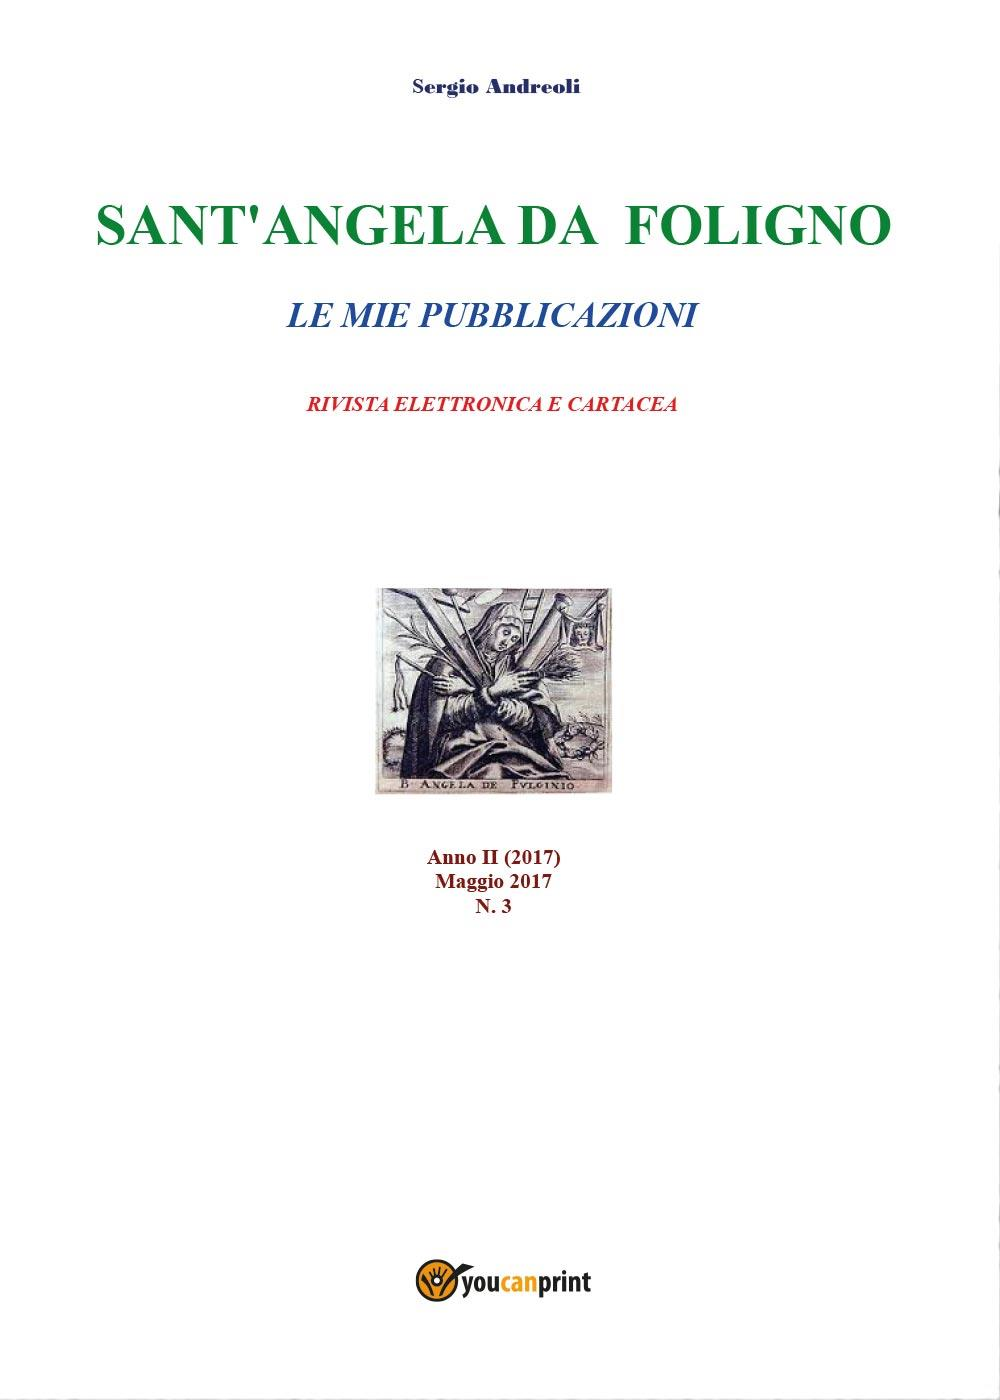 Sant'Angela da Foligno 3